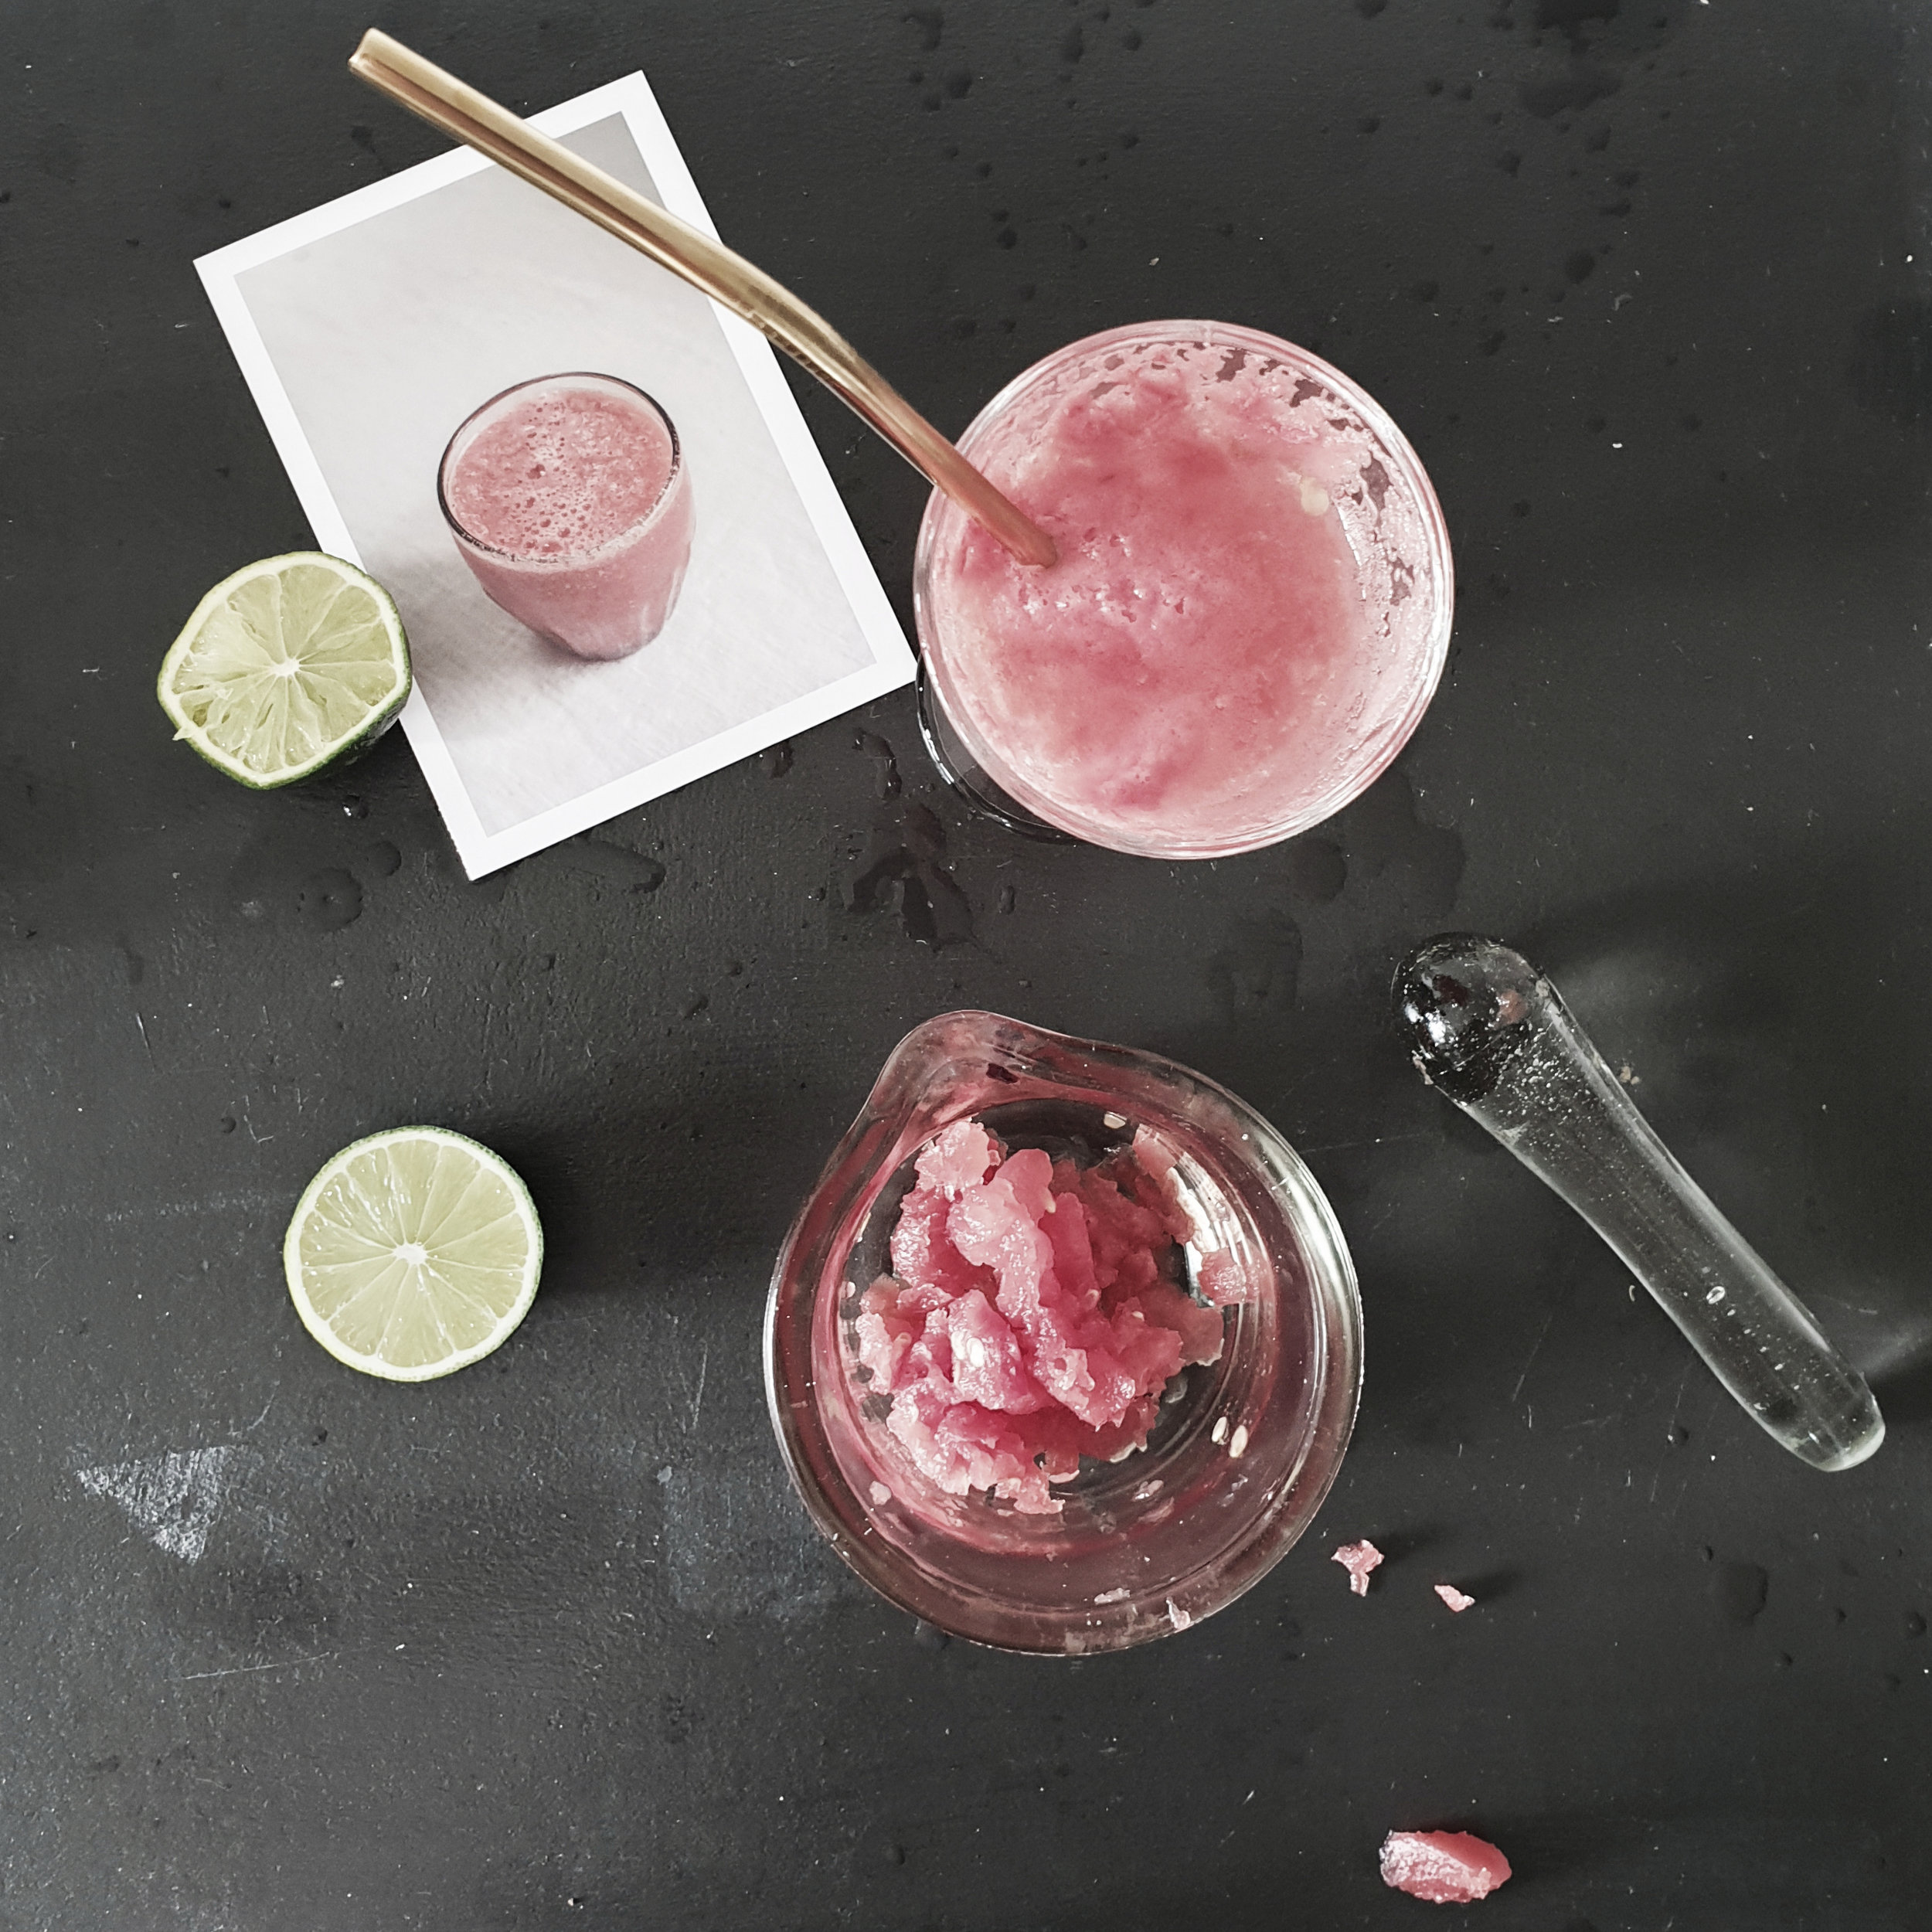 watermelon drink.jpg